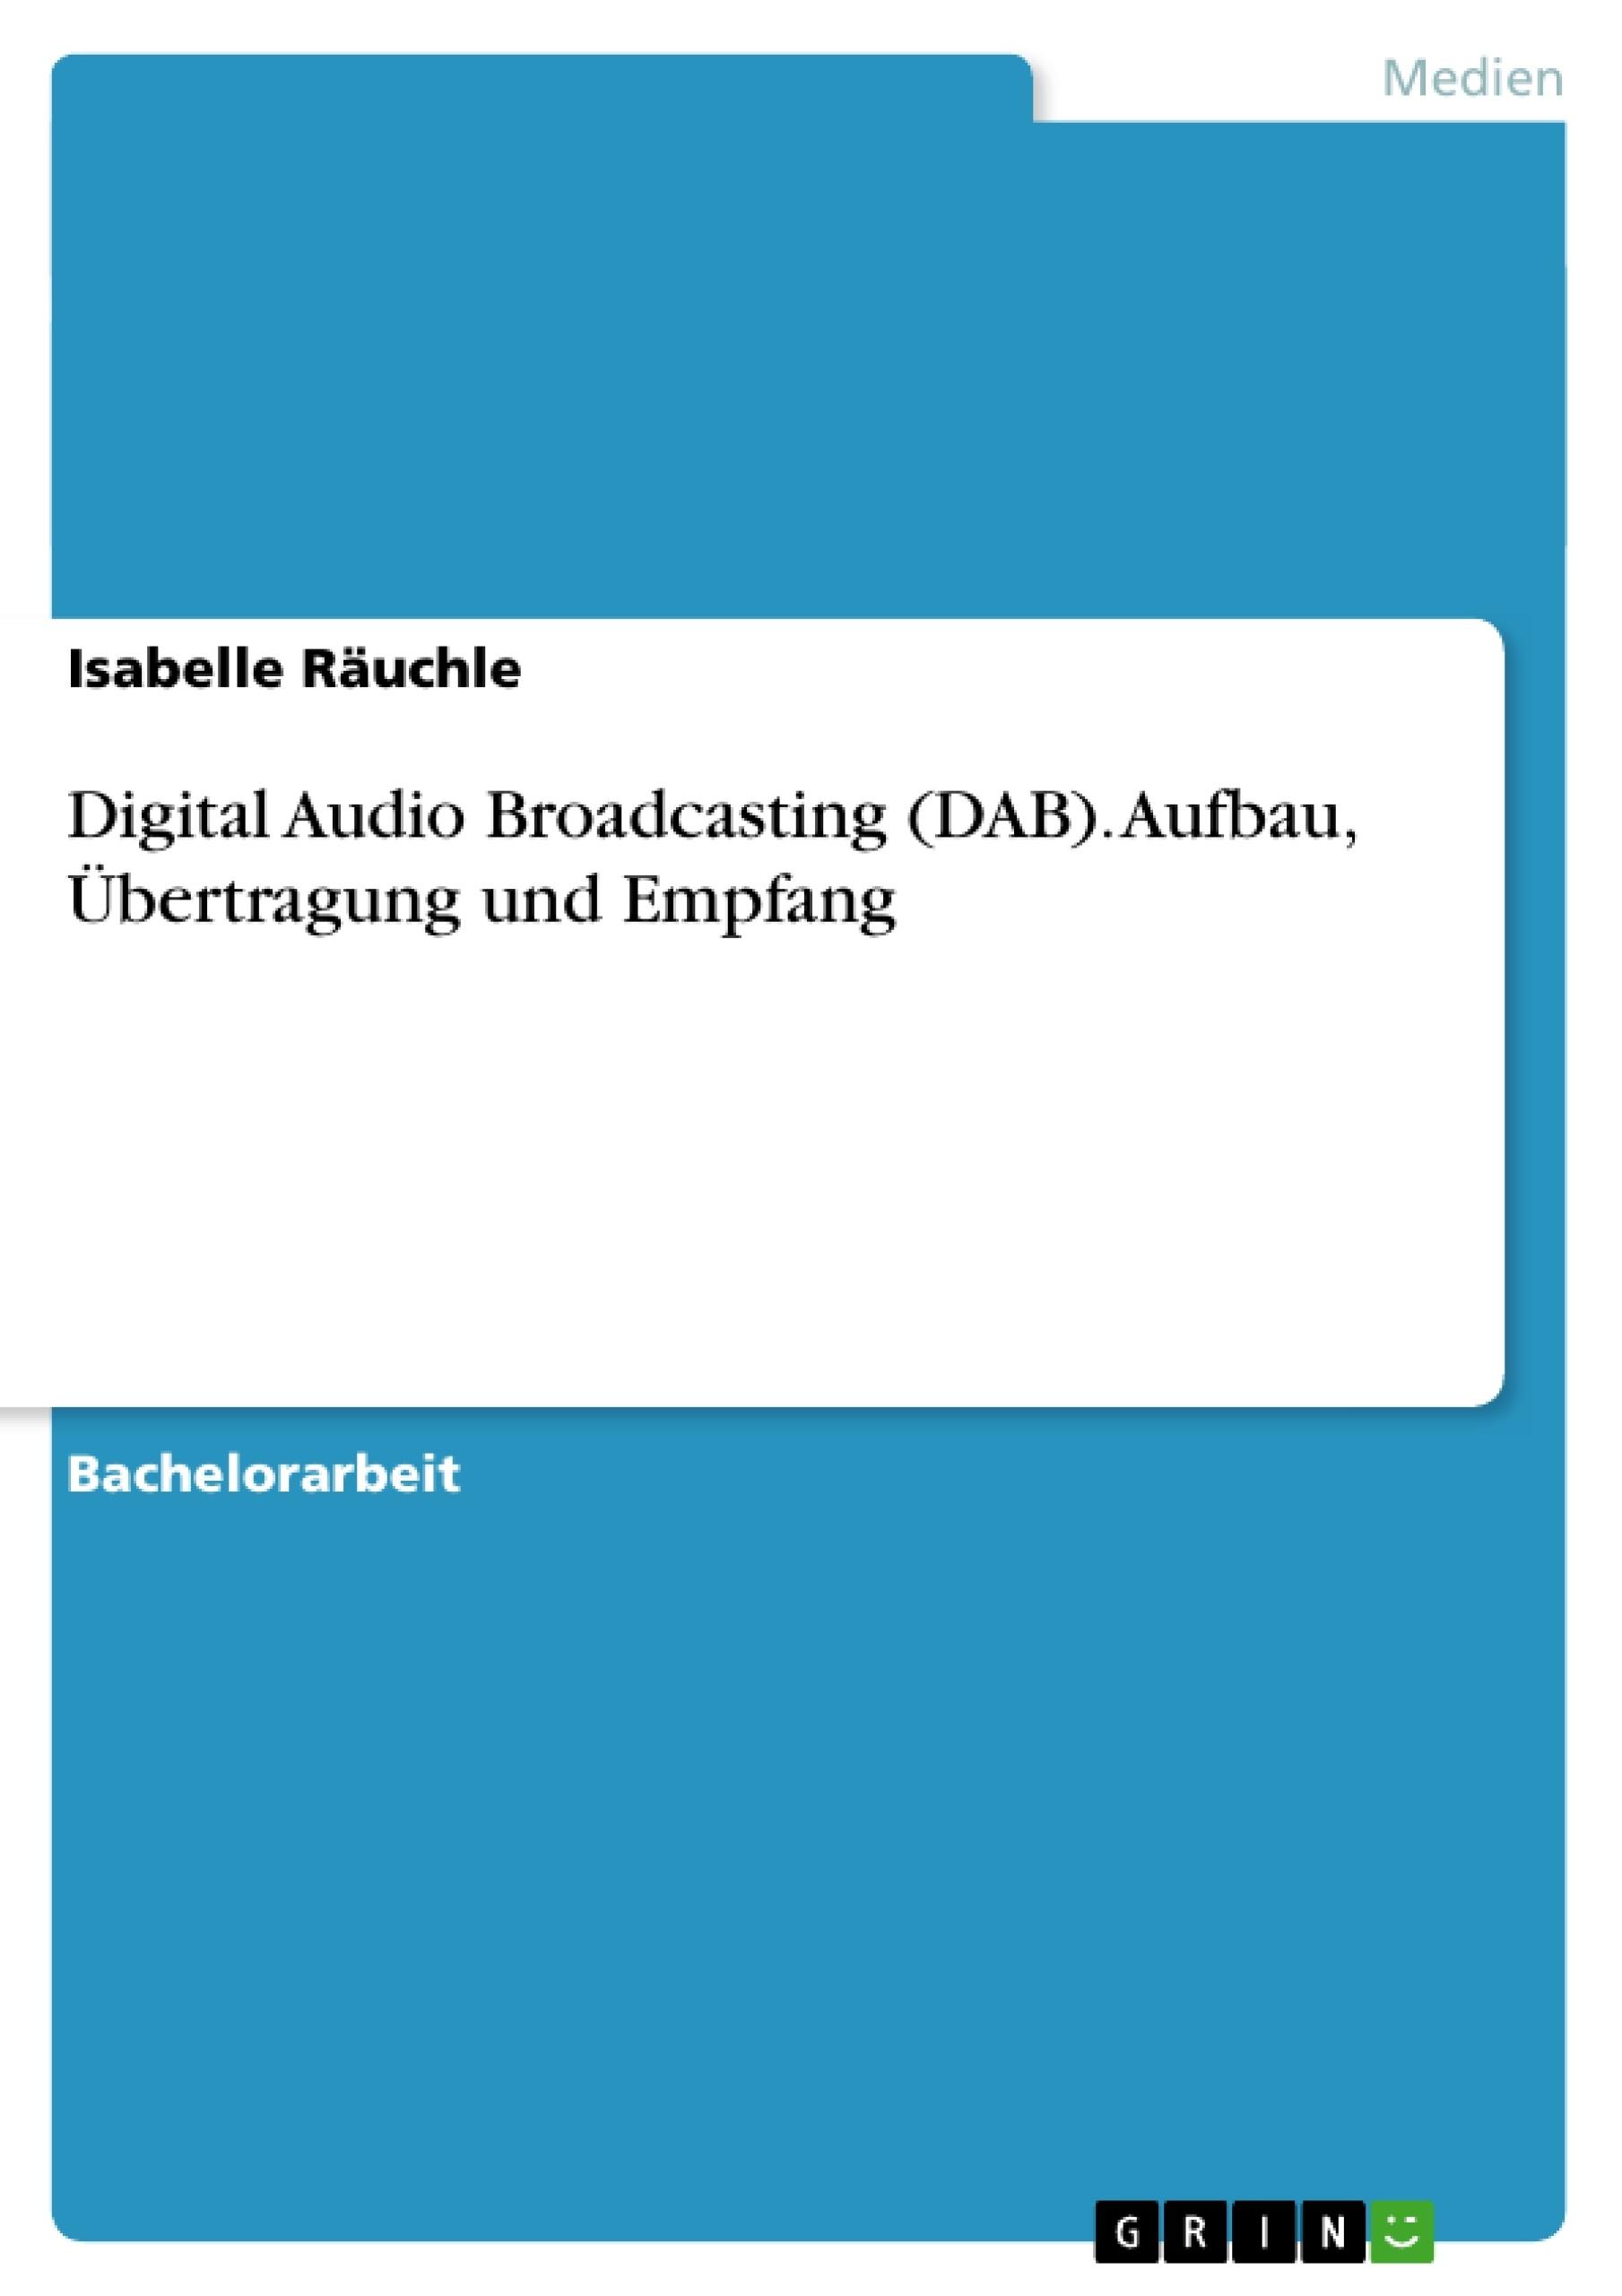 Titel: Digital Audio Broadcasting (DAB). Aufbau, Übertragung und Empfang